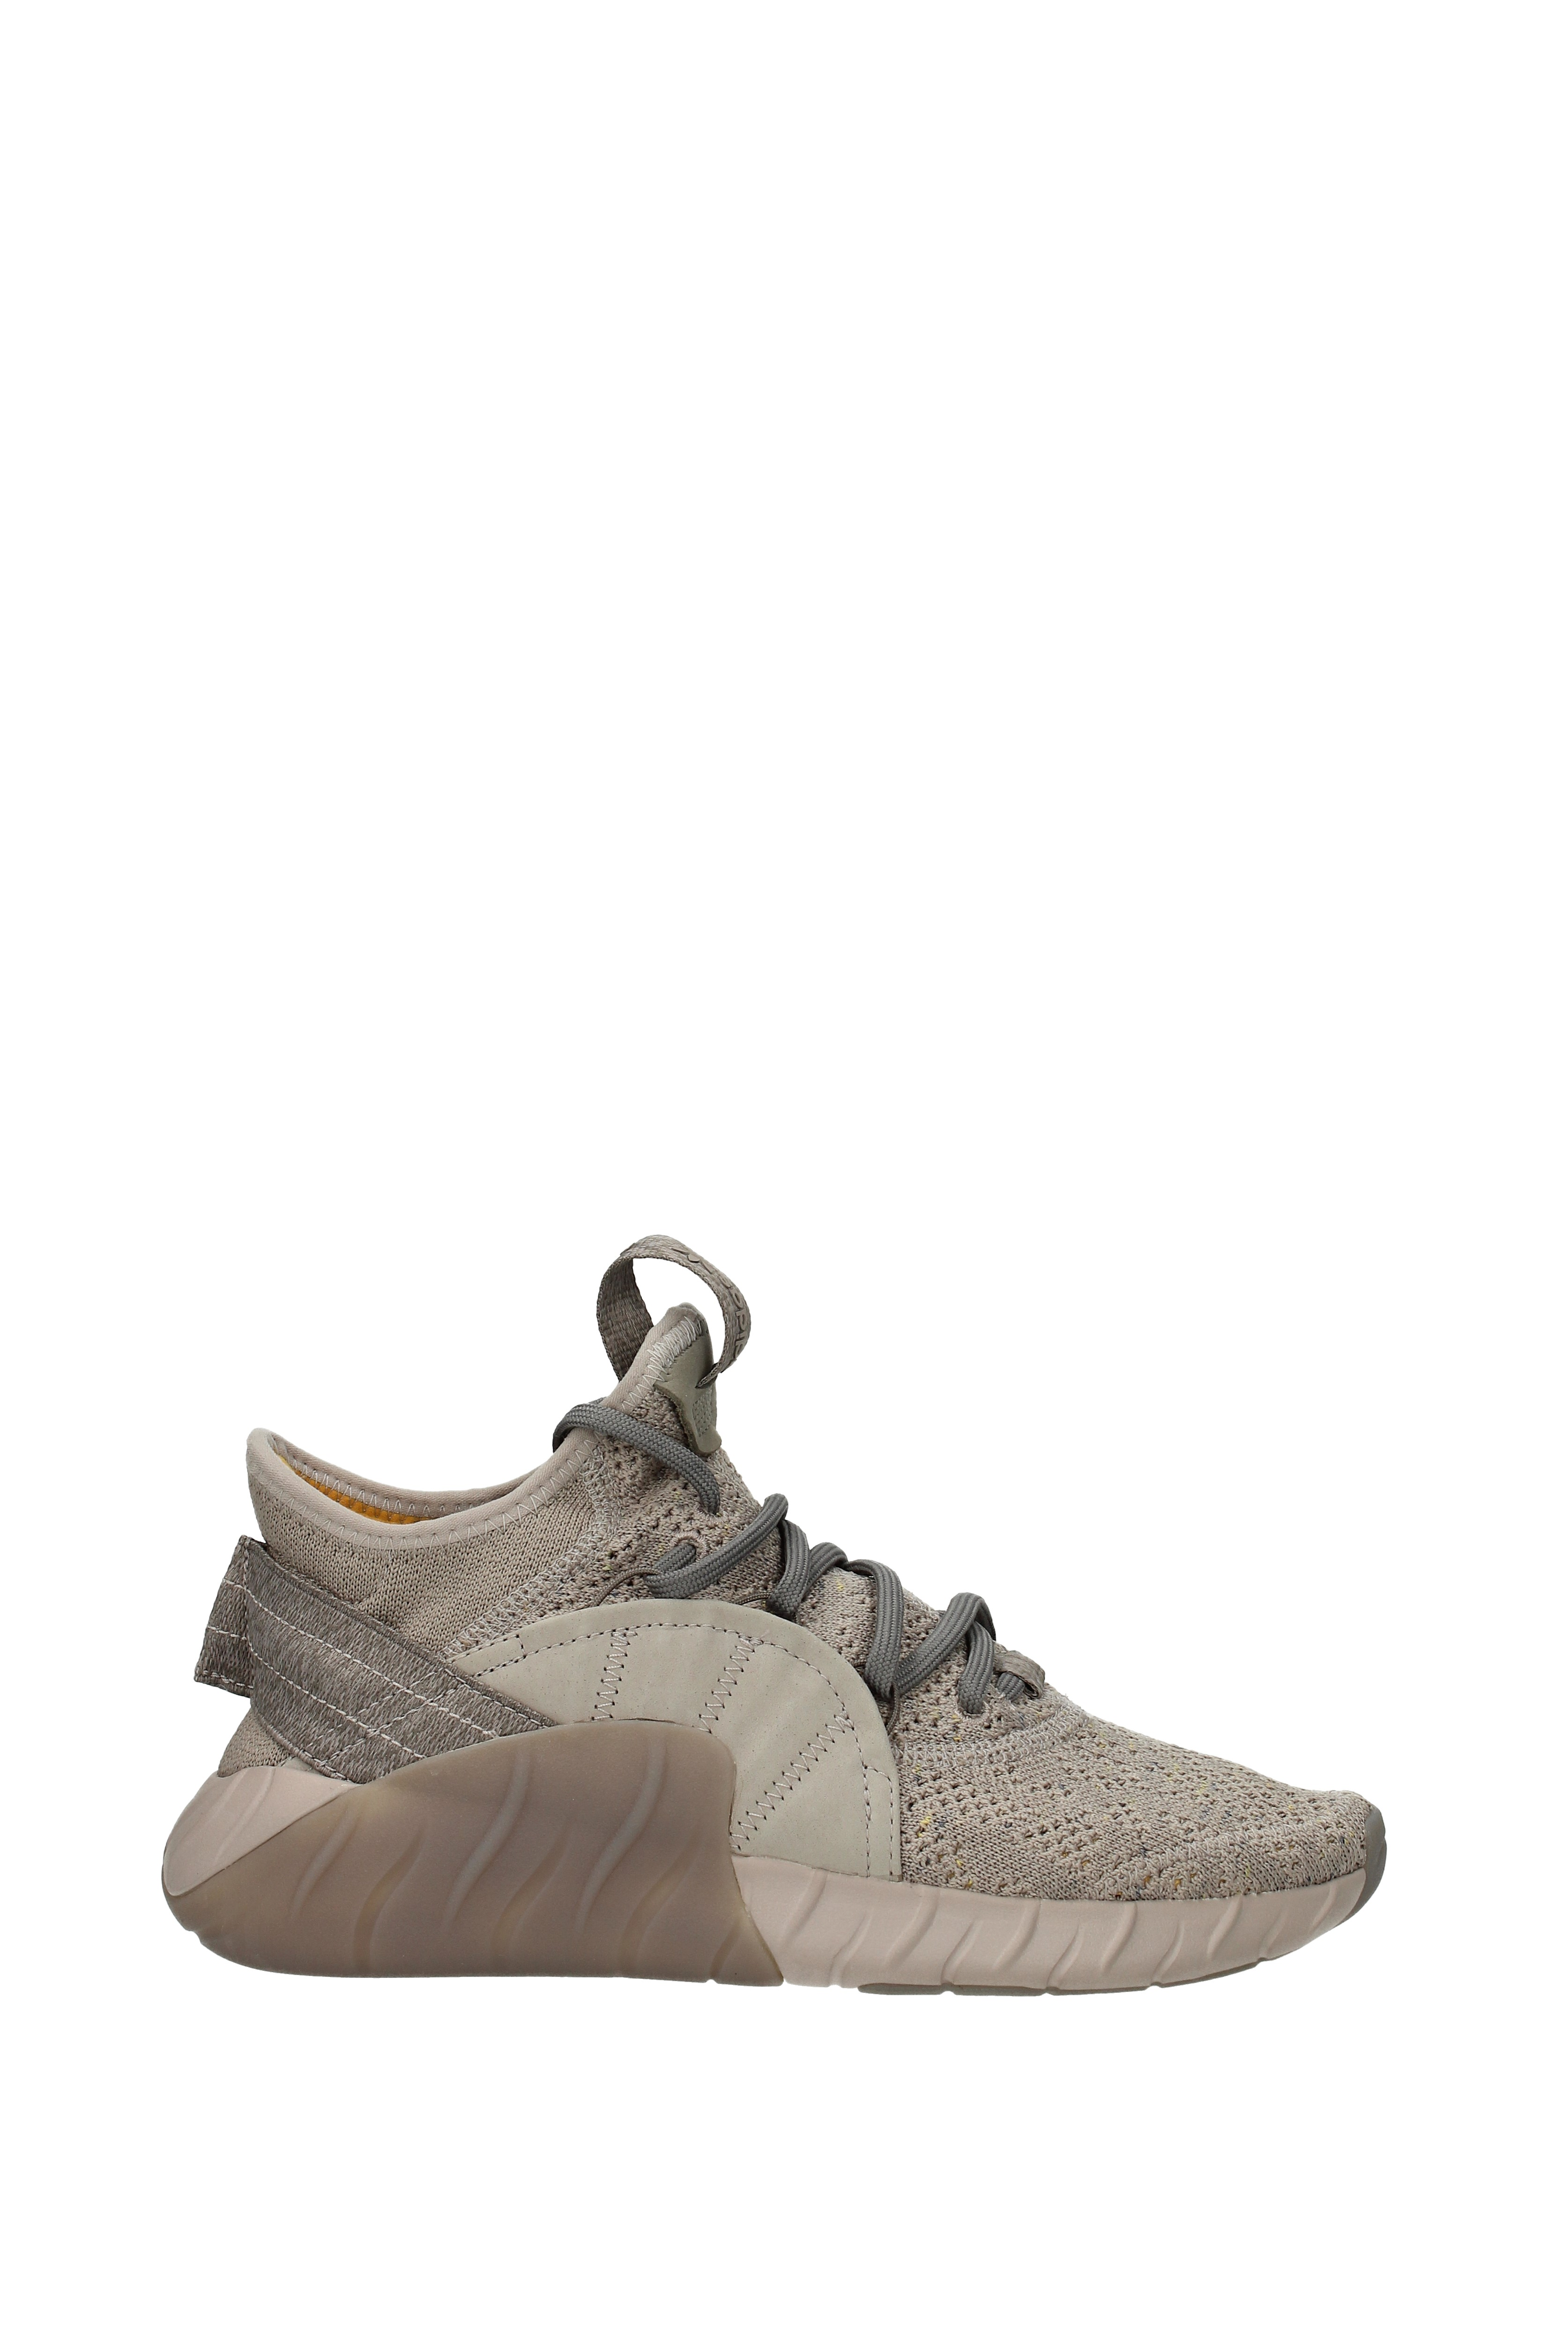 Zapatillas adidas tubular Rise Rise tubular caballeros-sustancia (by413) 9d96c5